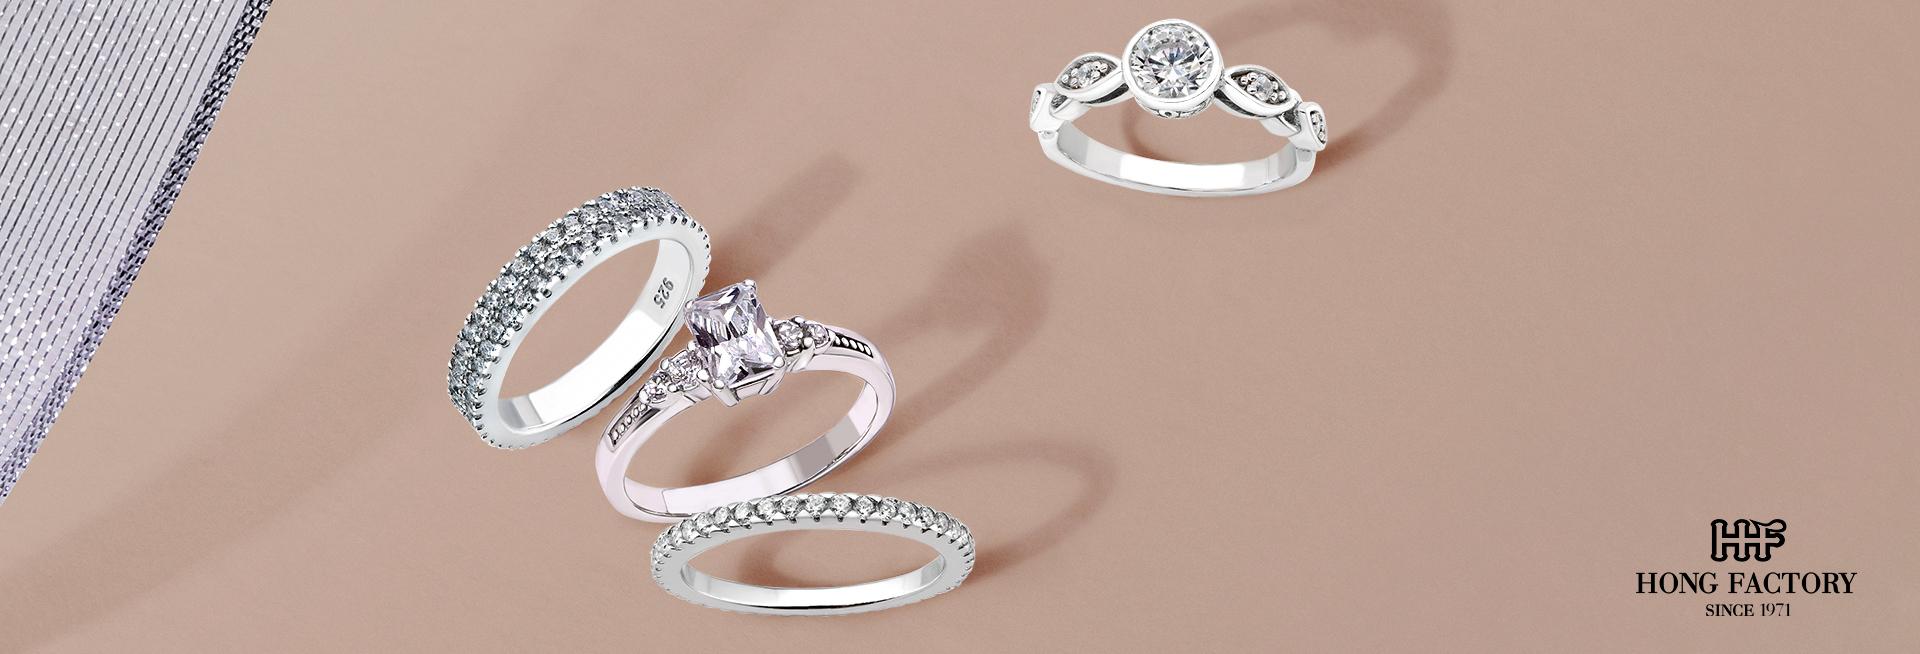 Slider Wholesale Jewelry 445